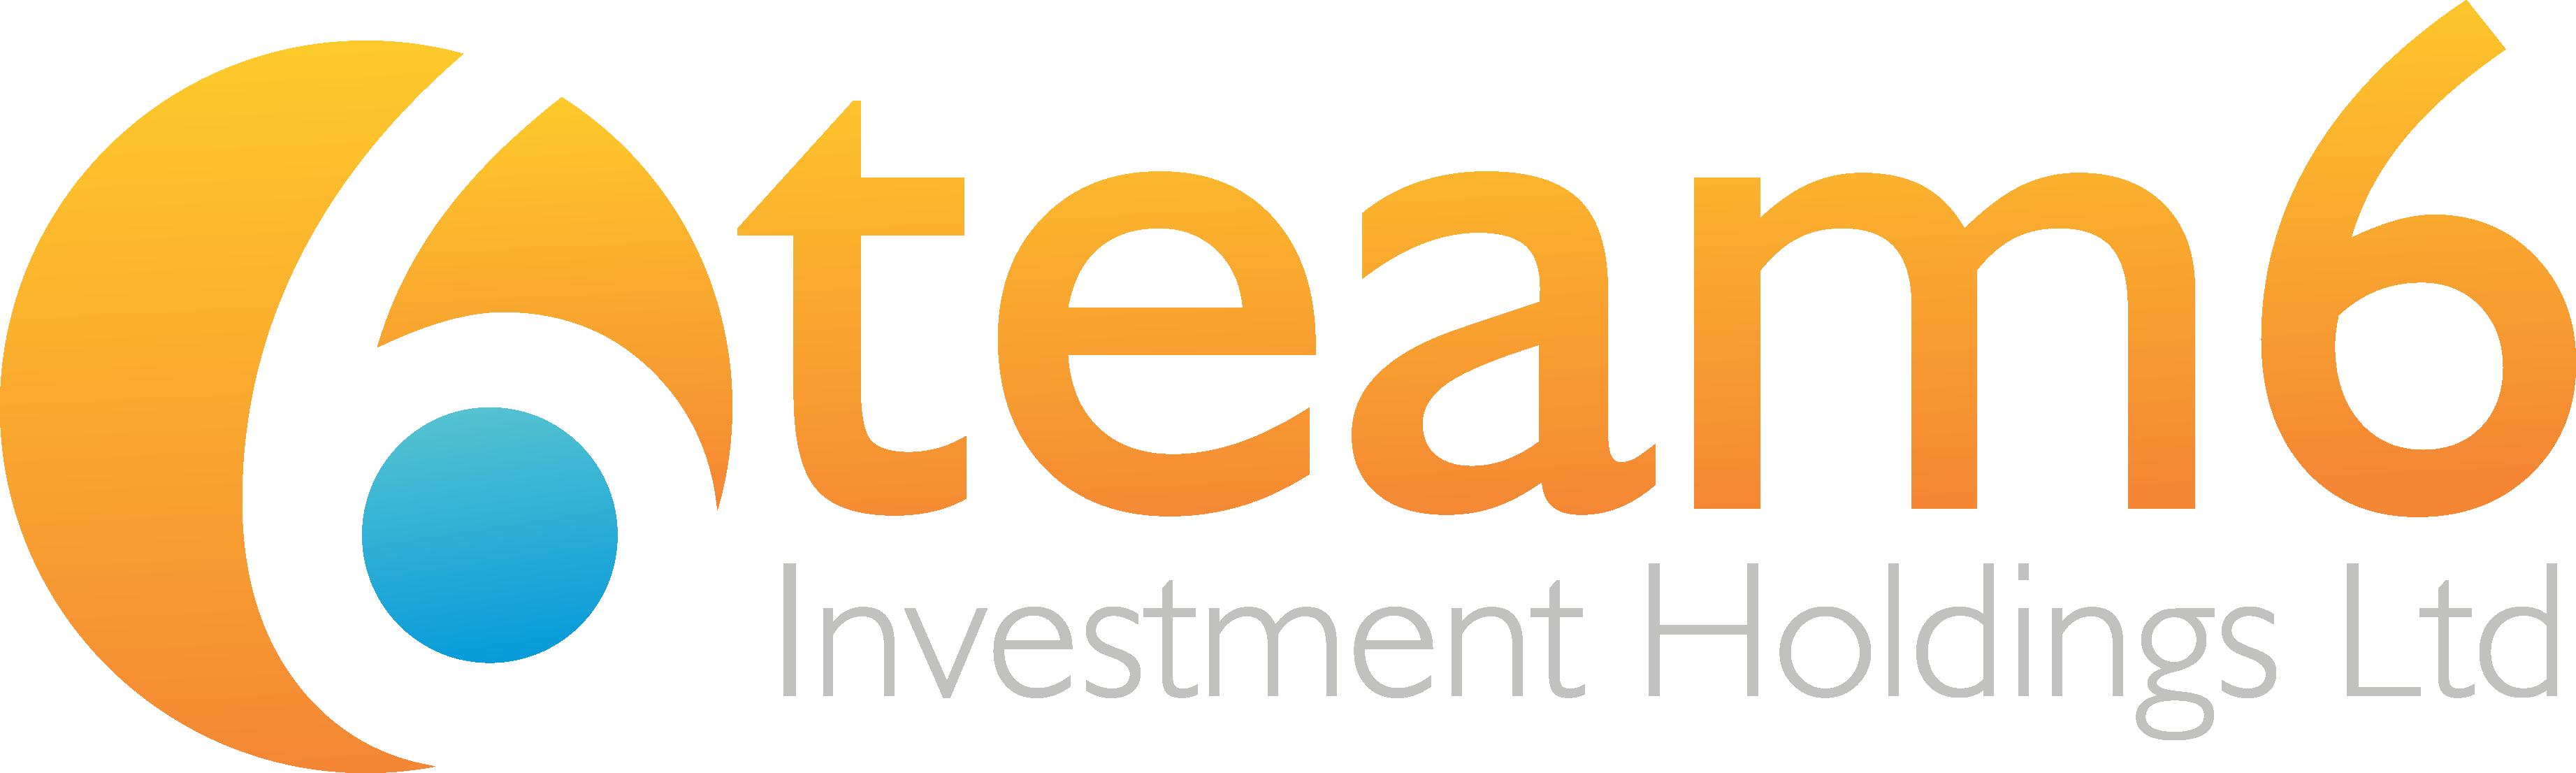 team6investments.com.